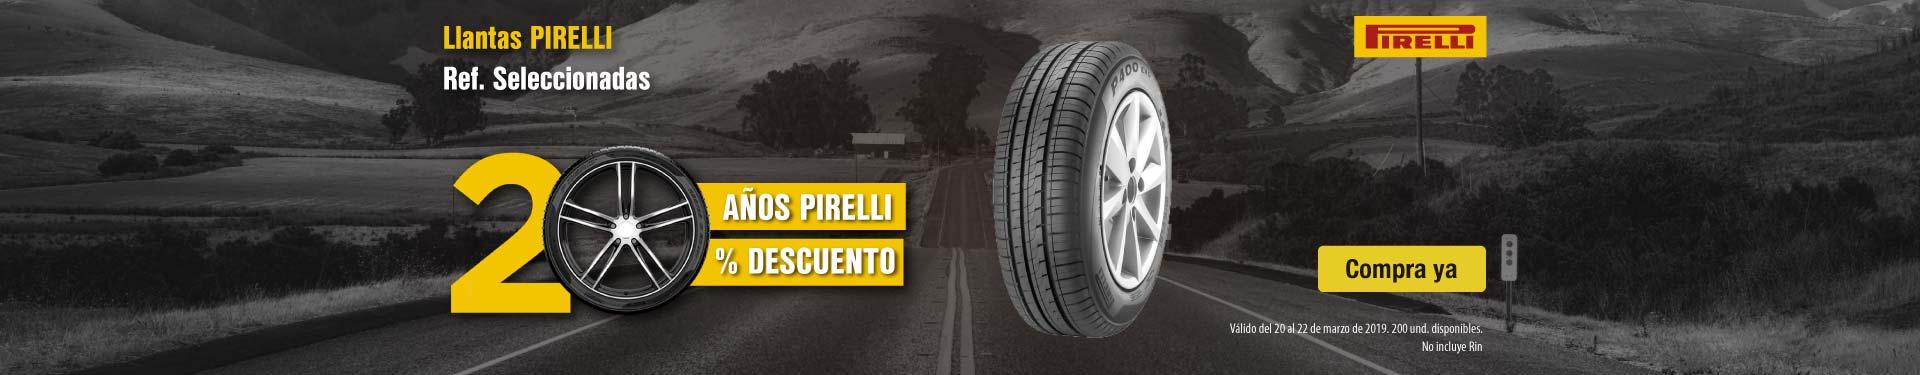 AK-PPAL-2-Llantas-Pirelli-Mar20-D